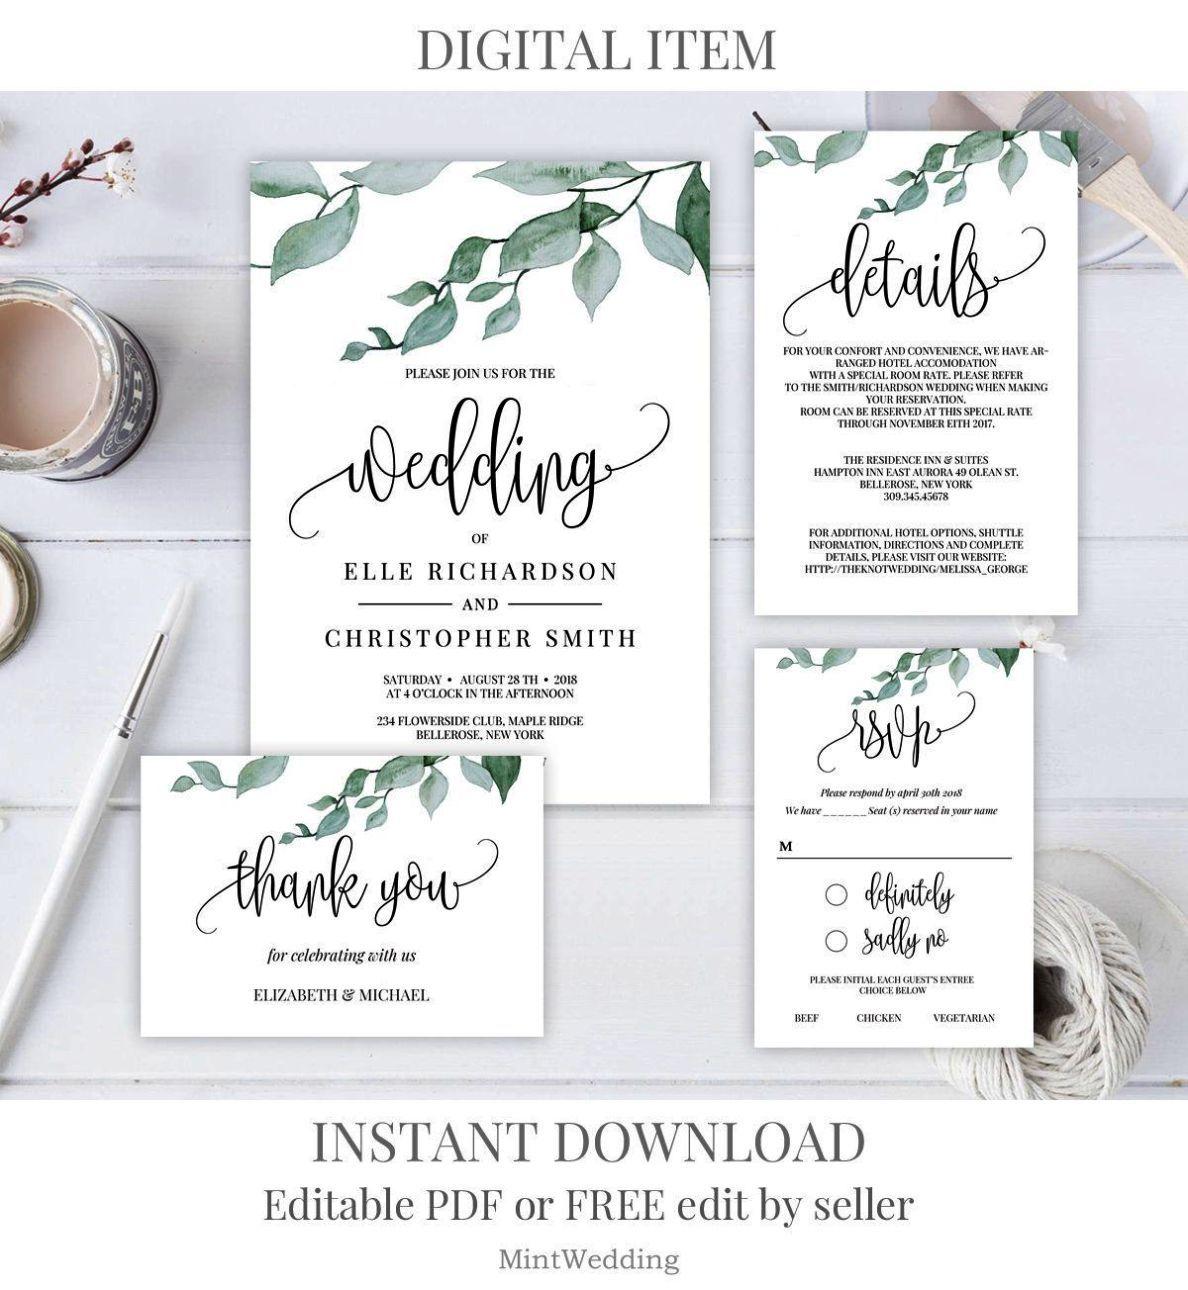 Diy Wedding Invitations Singapore In Wedding Rings Meme Nor Diy Wedding Wedding Invitation Templates Rustic Wedding Invitation Cards Beach Wedding Invitations